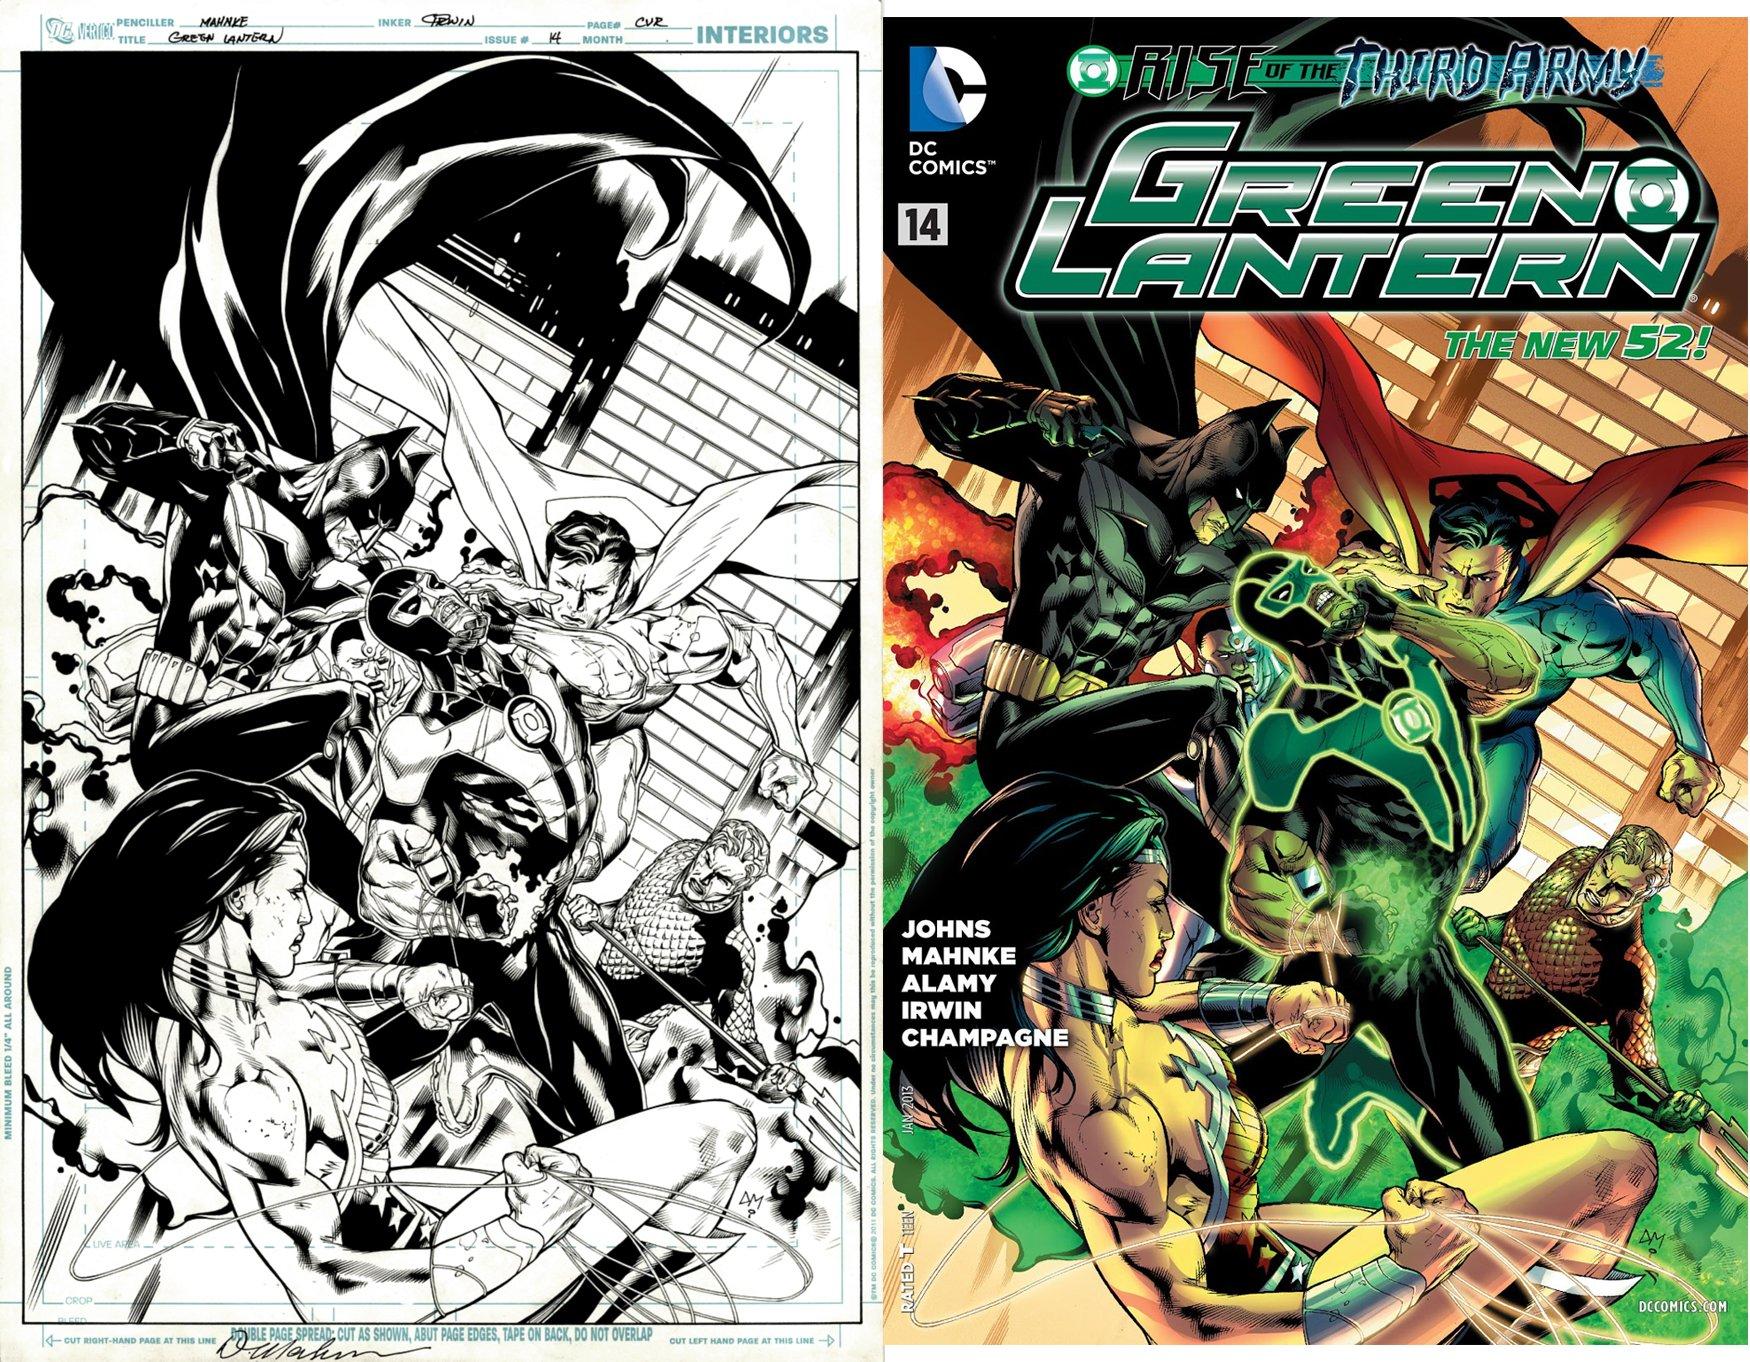 Green Lantern #14 Cover (6 JLA: Green Lantern, Aquaman, Batman, Cyborg, Superman, Wonder Woman!) 2012